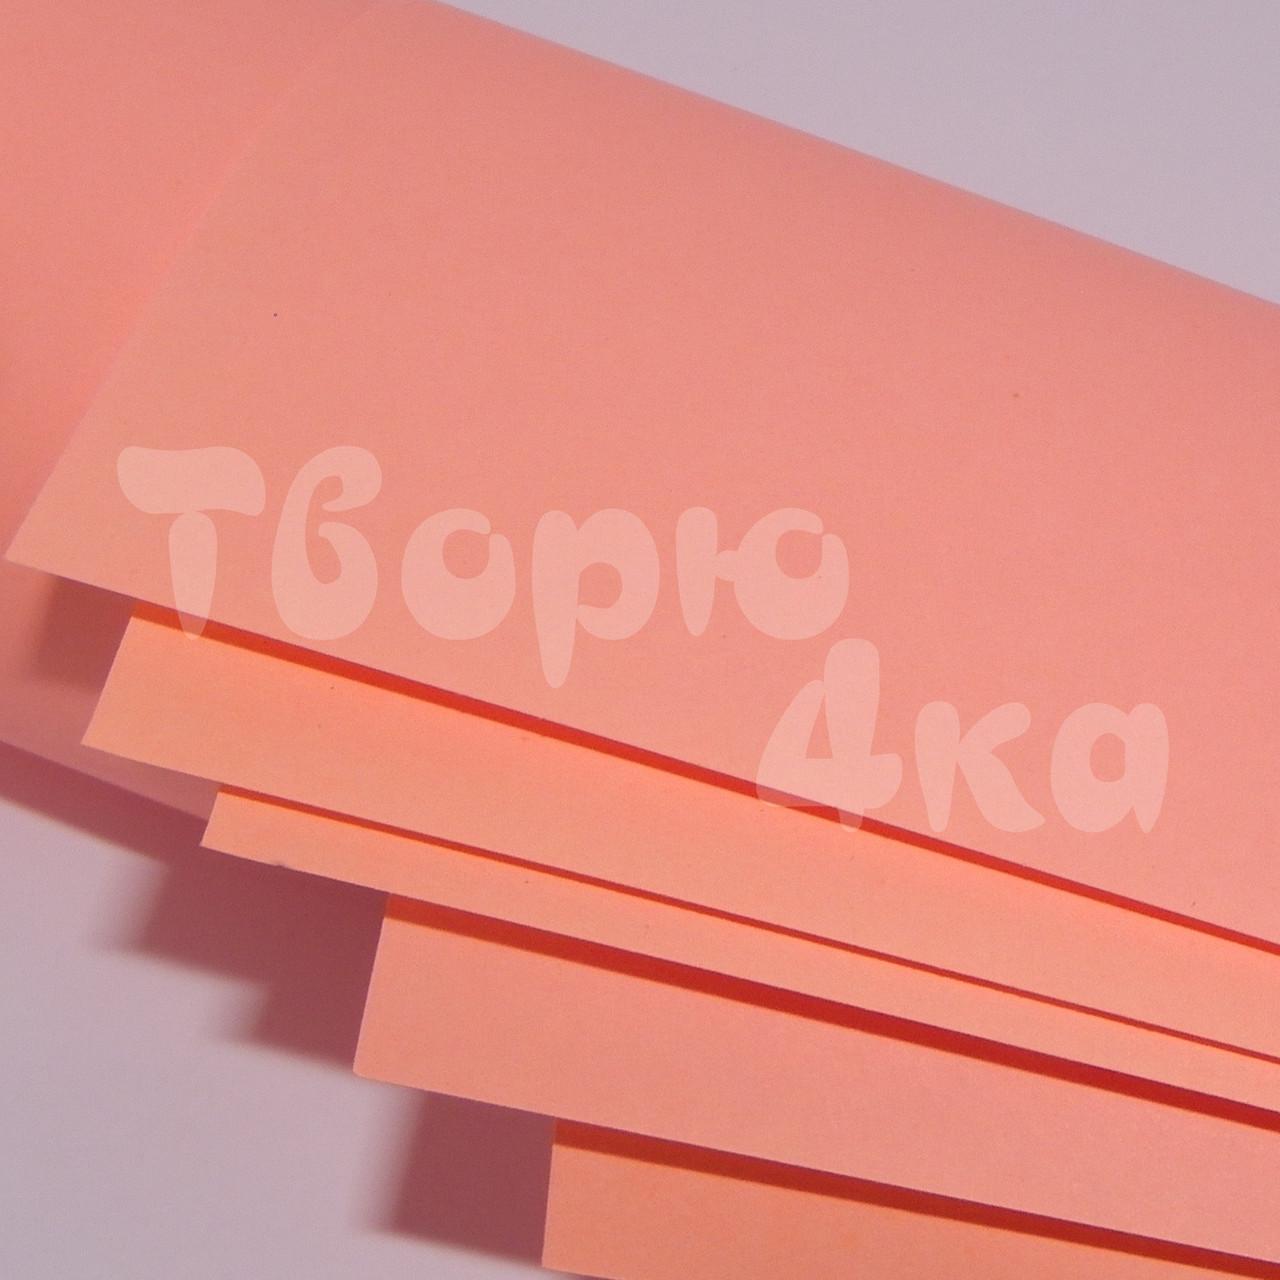 Бумага цветная А4 80 гр/м.кв cyber pink (кислотный розовый)